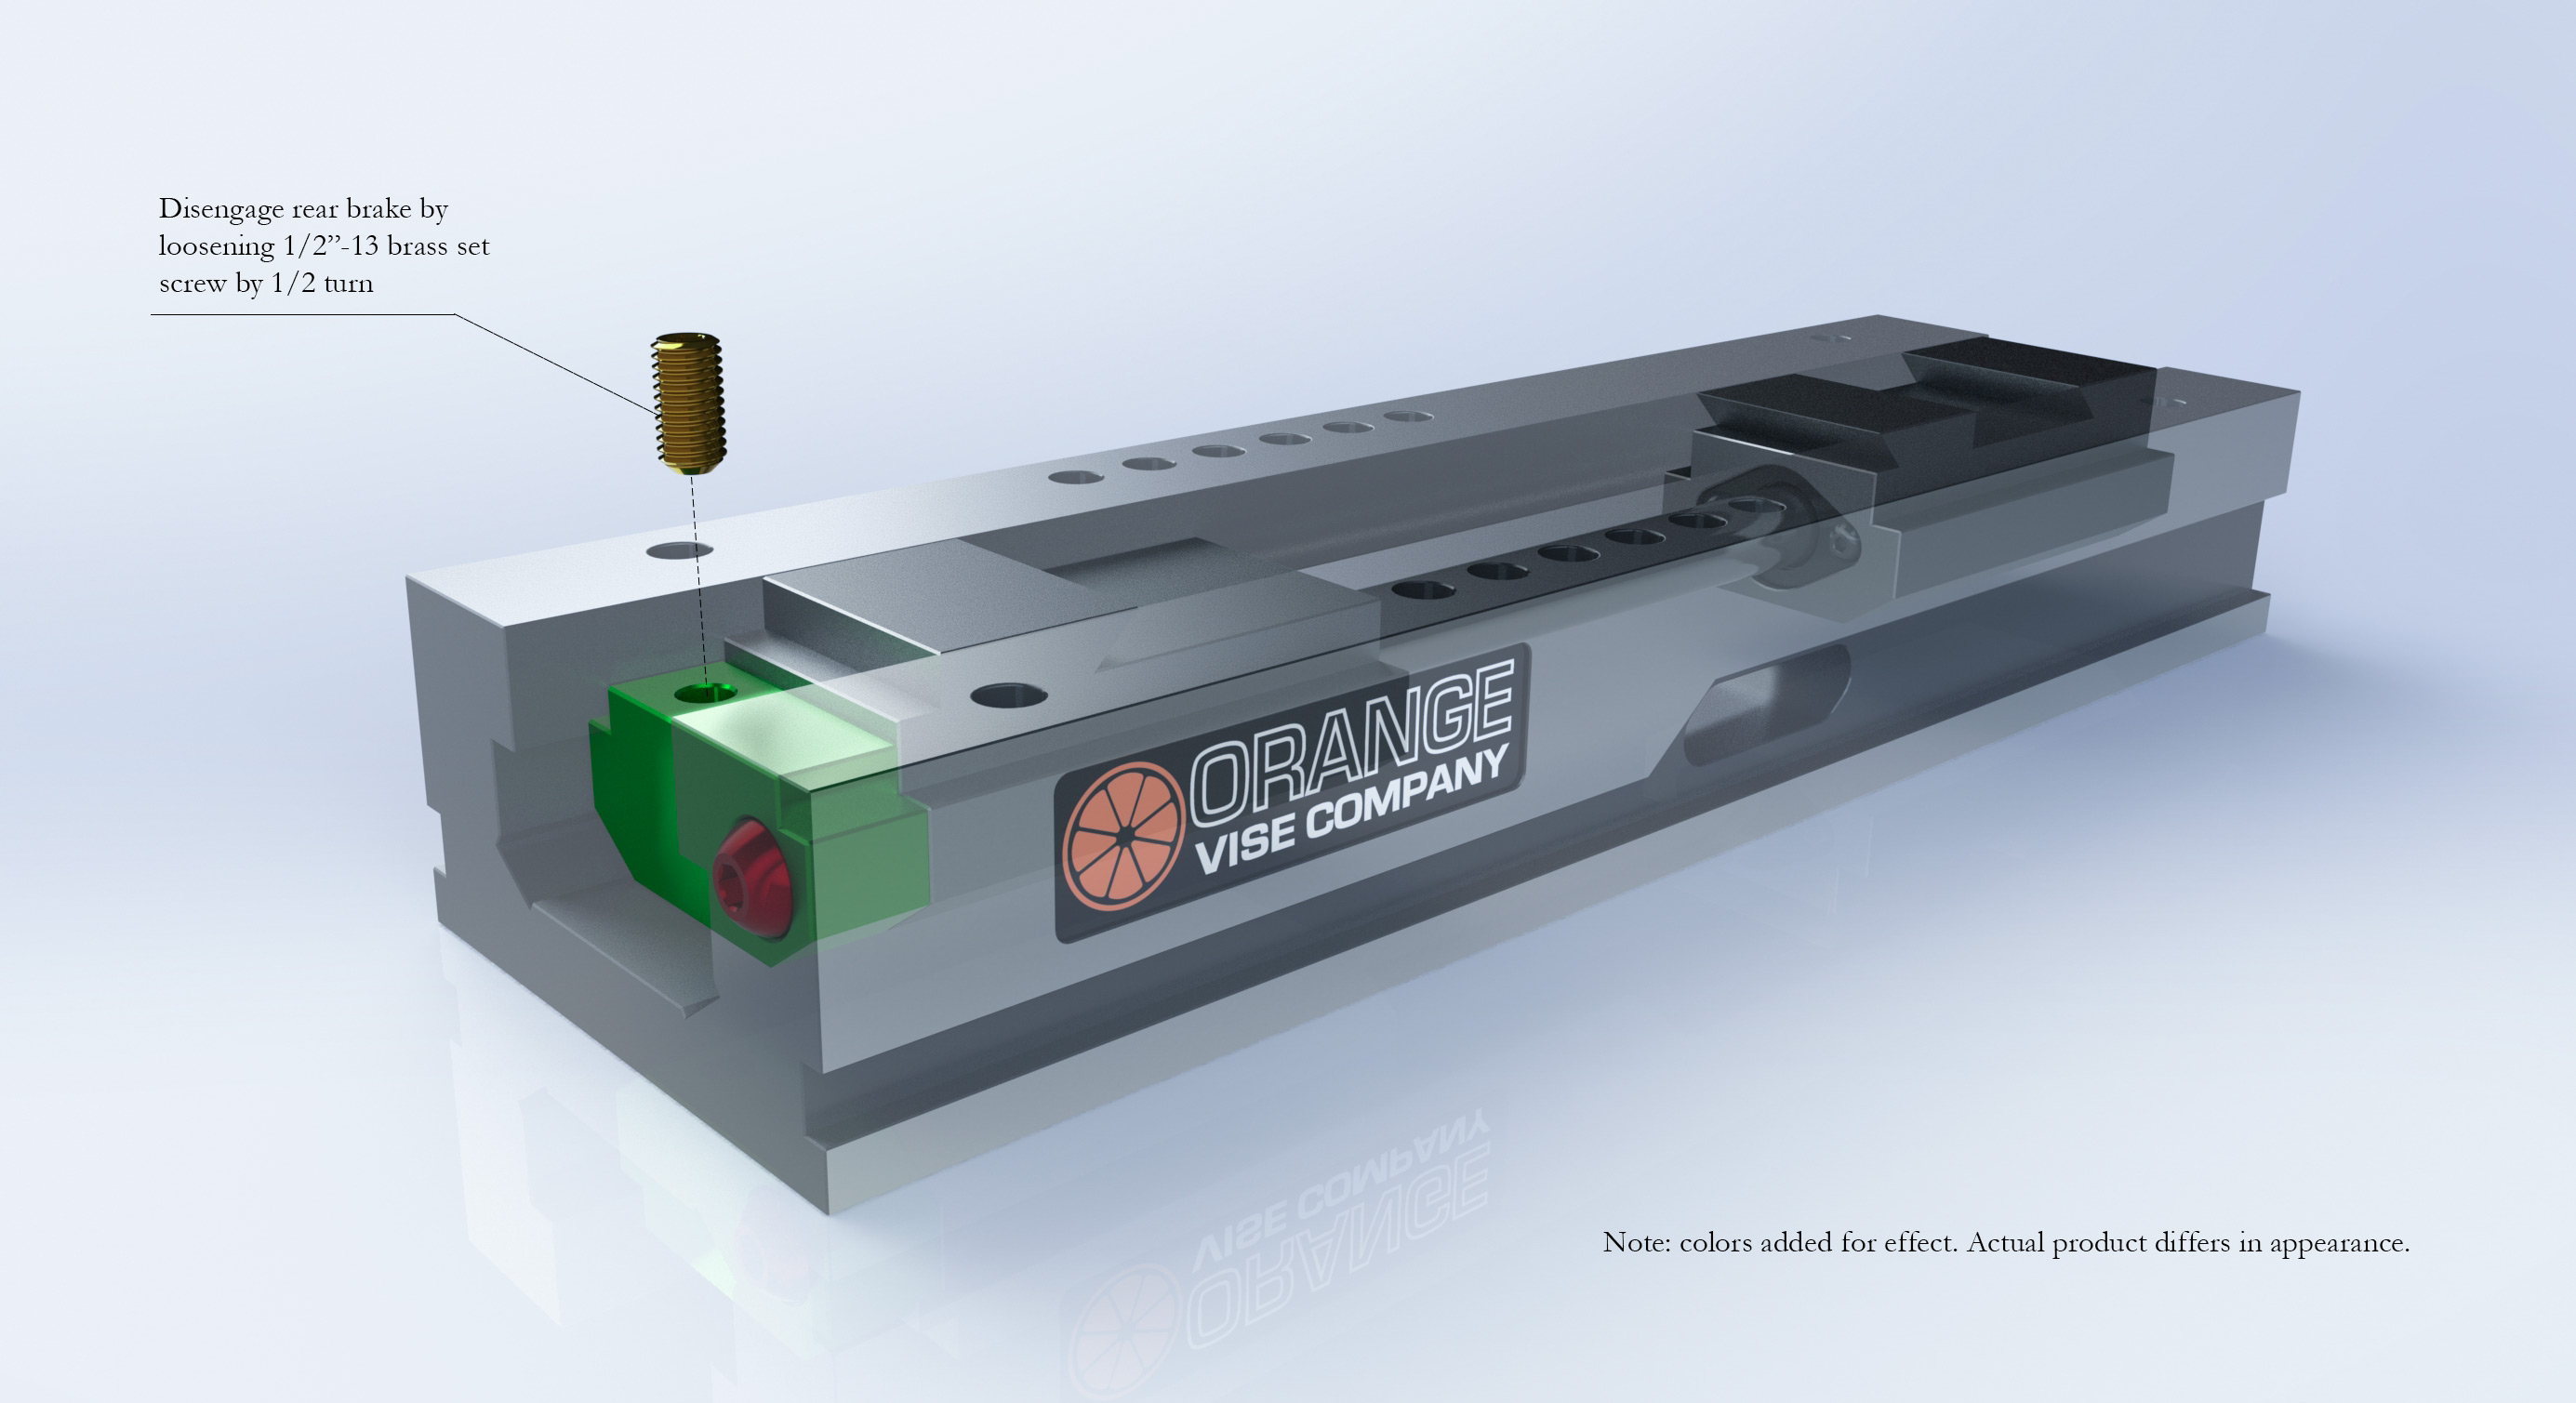 Dual Station Operating Instructions - Orange Vise Company LLC